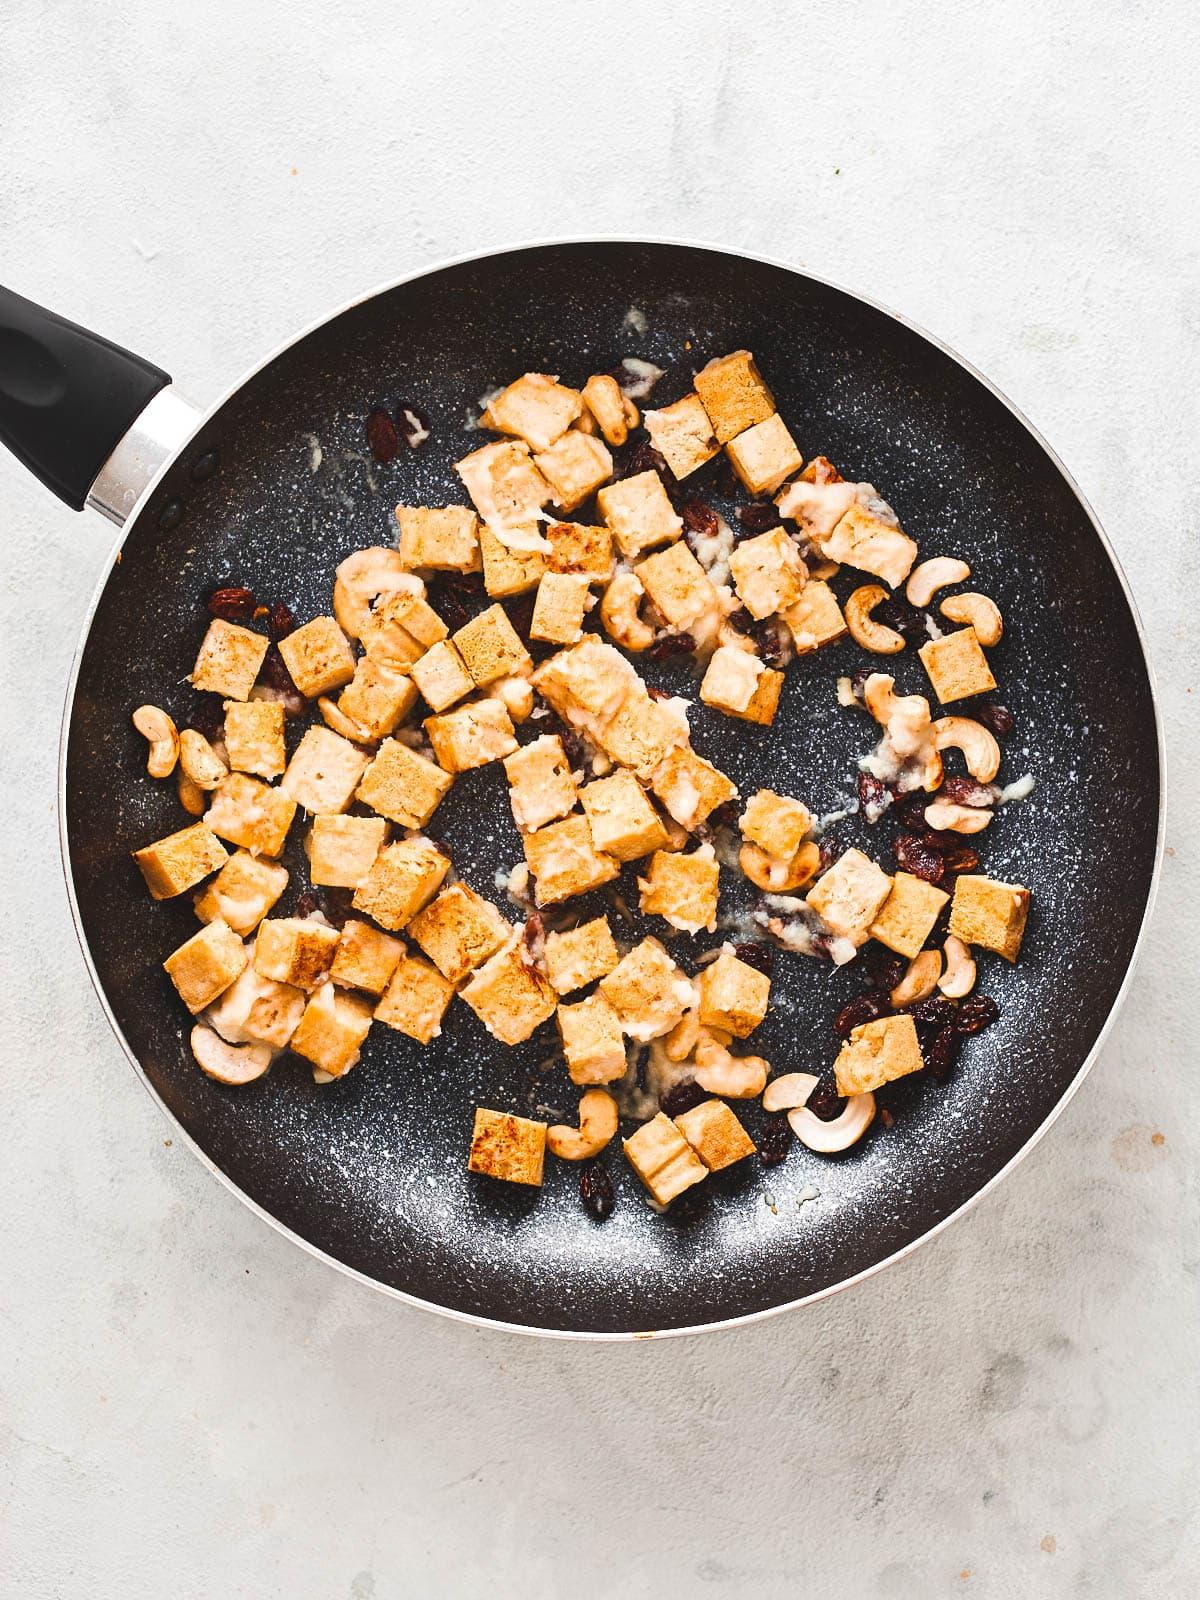 Paste stirred around in the pan with tofu, cashews and raisins